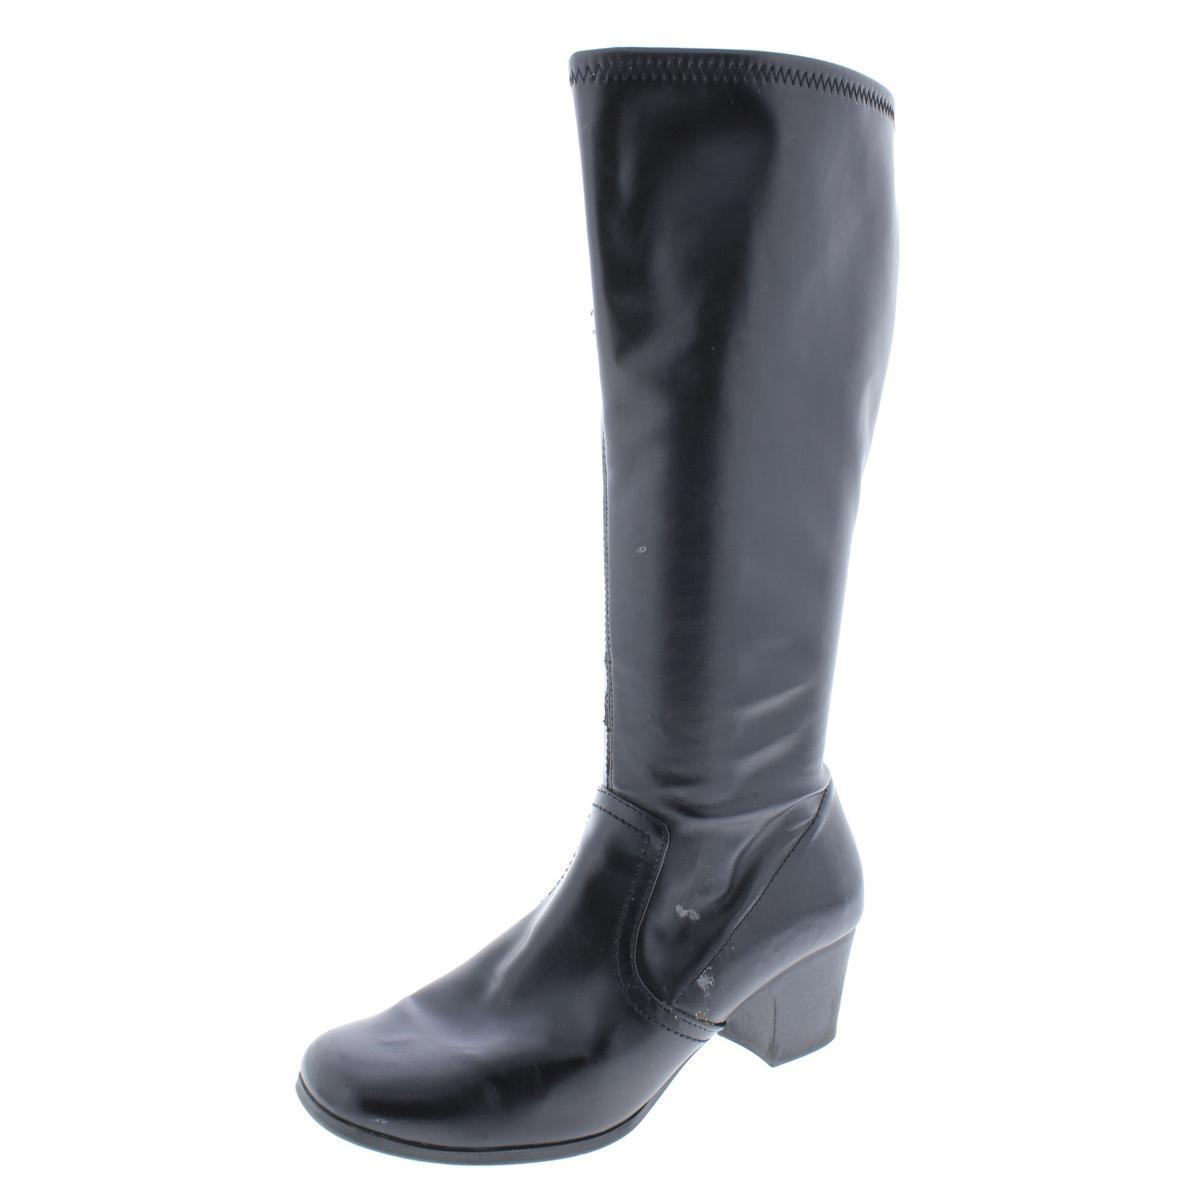 Relativity Womens Madlyn Black Knee-High Boots shoes 7 Medium (B,M) BHFO 4843